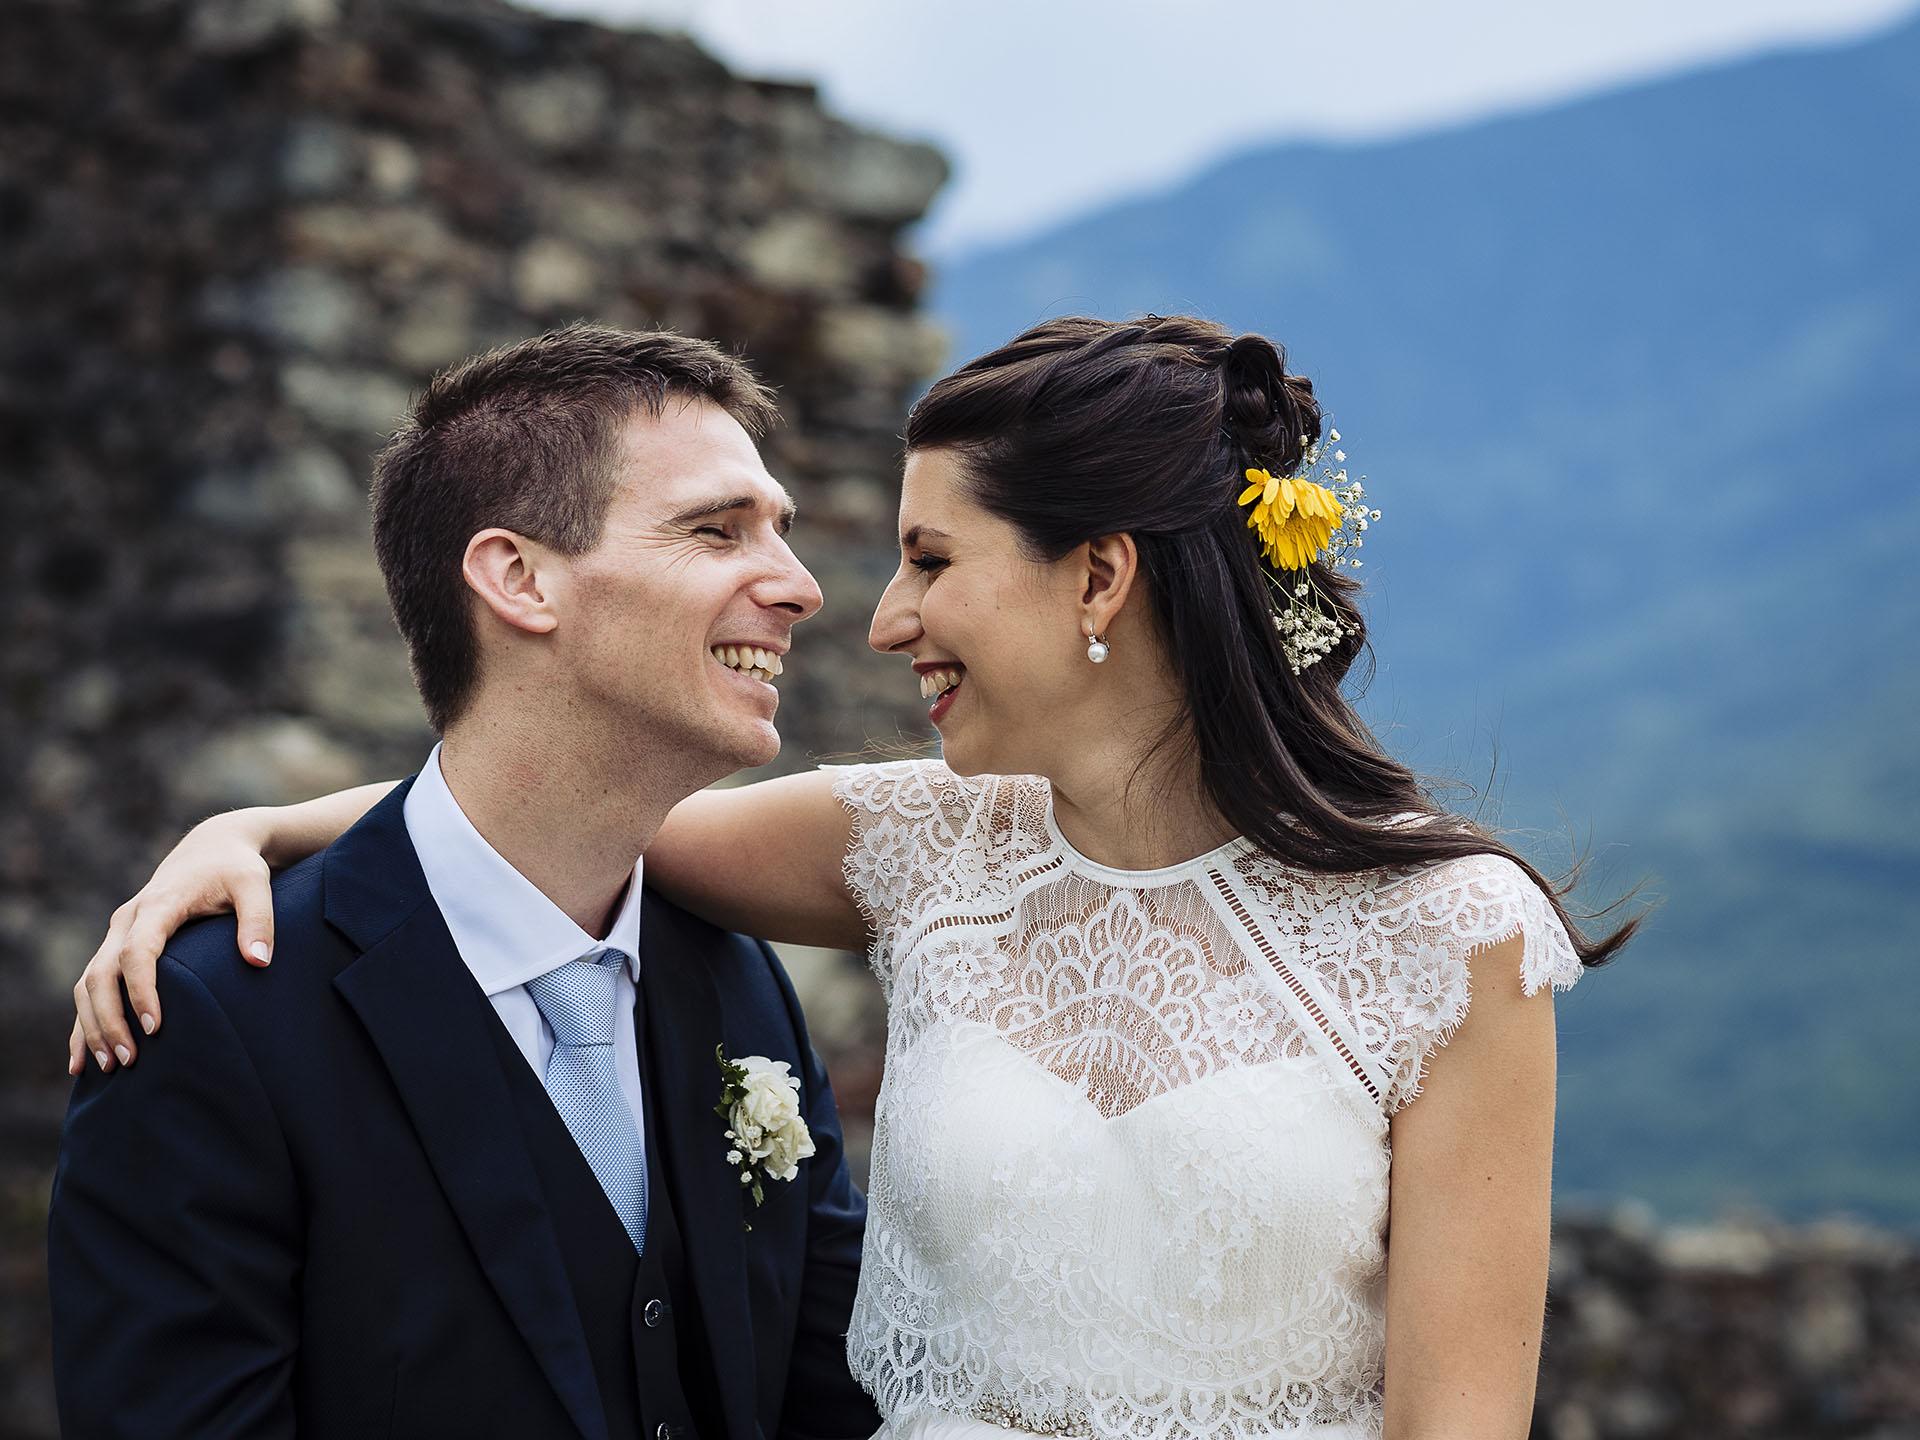 Matrimoni - Galleria di matrimoni - Wedding - Matrimonio al Castel Grumello - Sondrio